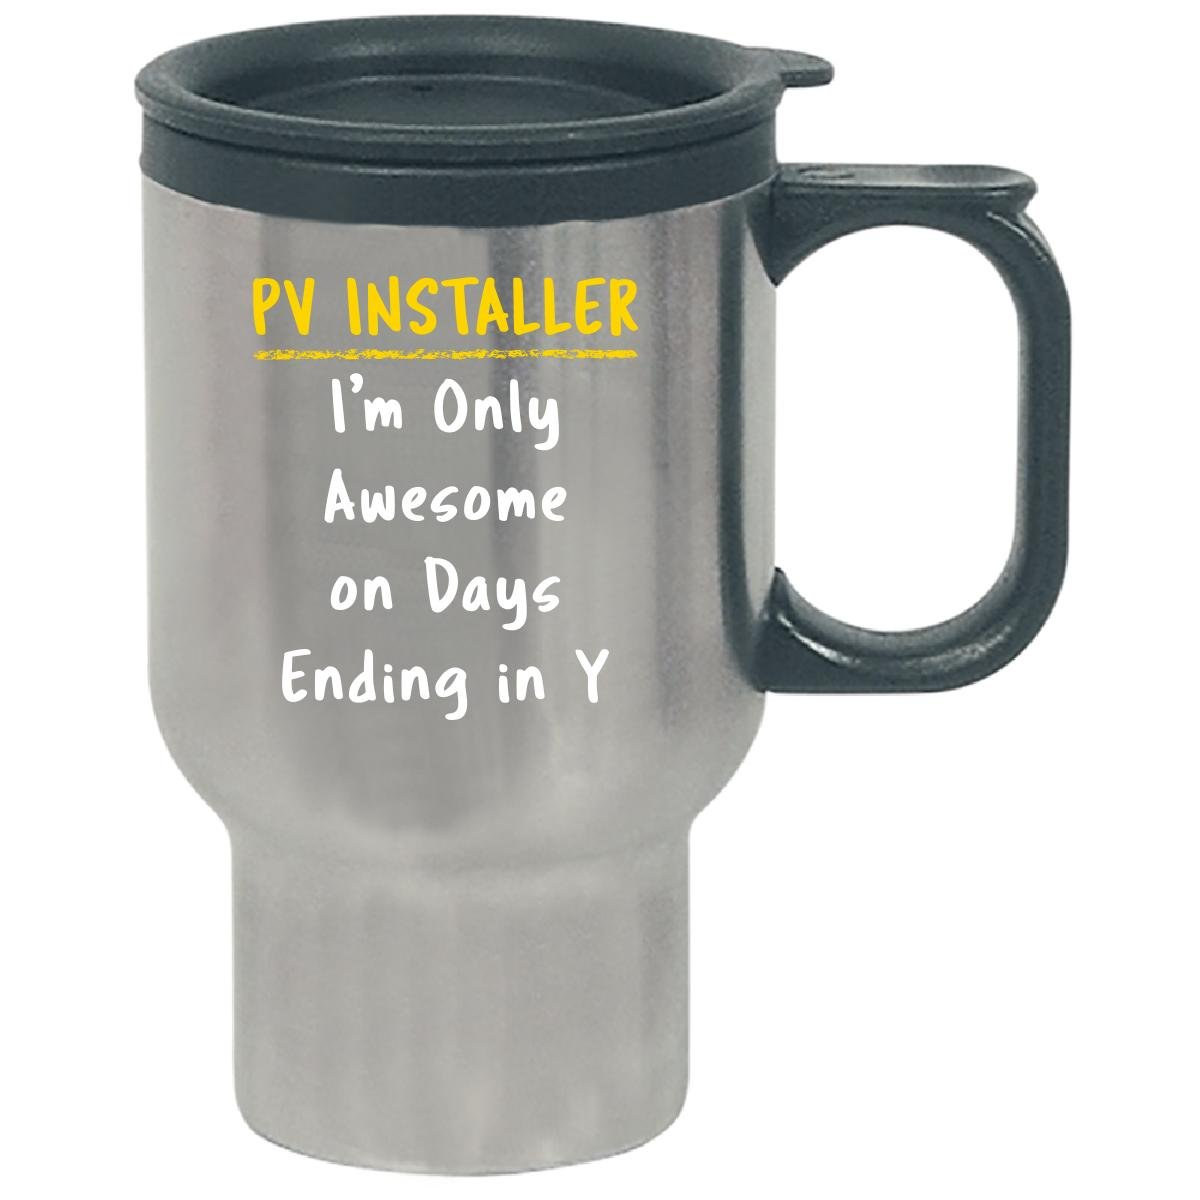 Pv Installer Awesome Sarcastic Funny Saying Solar Job Gift - Travel Mug